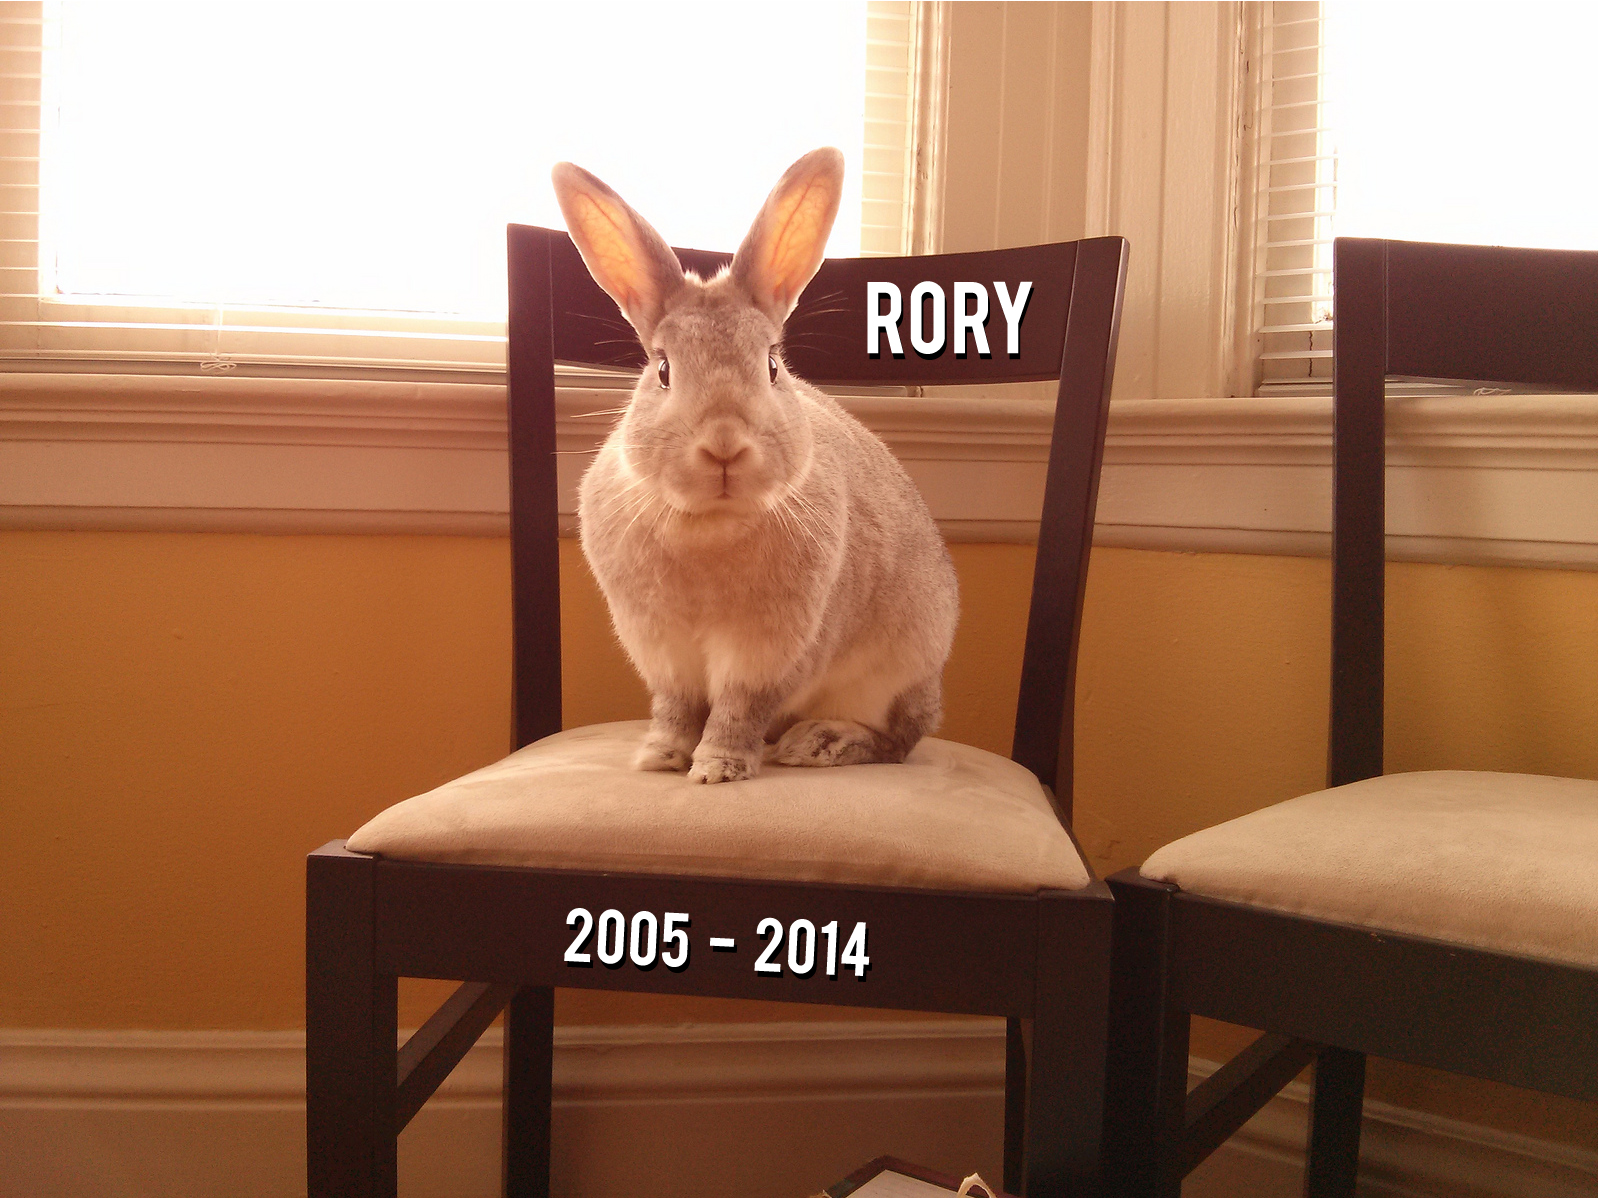 Rory RIP